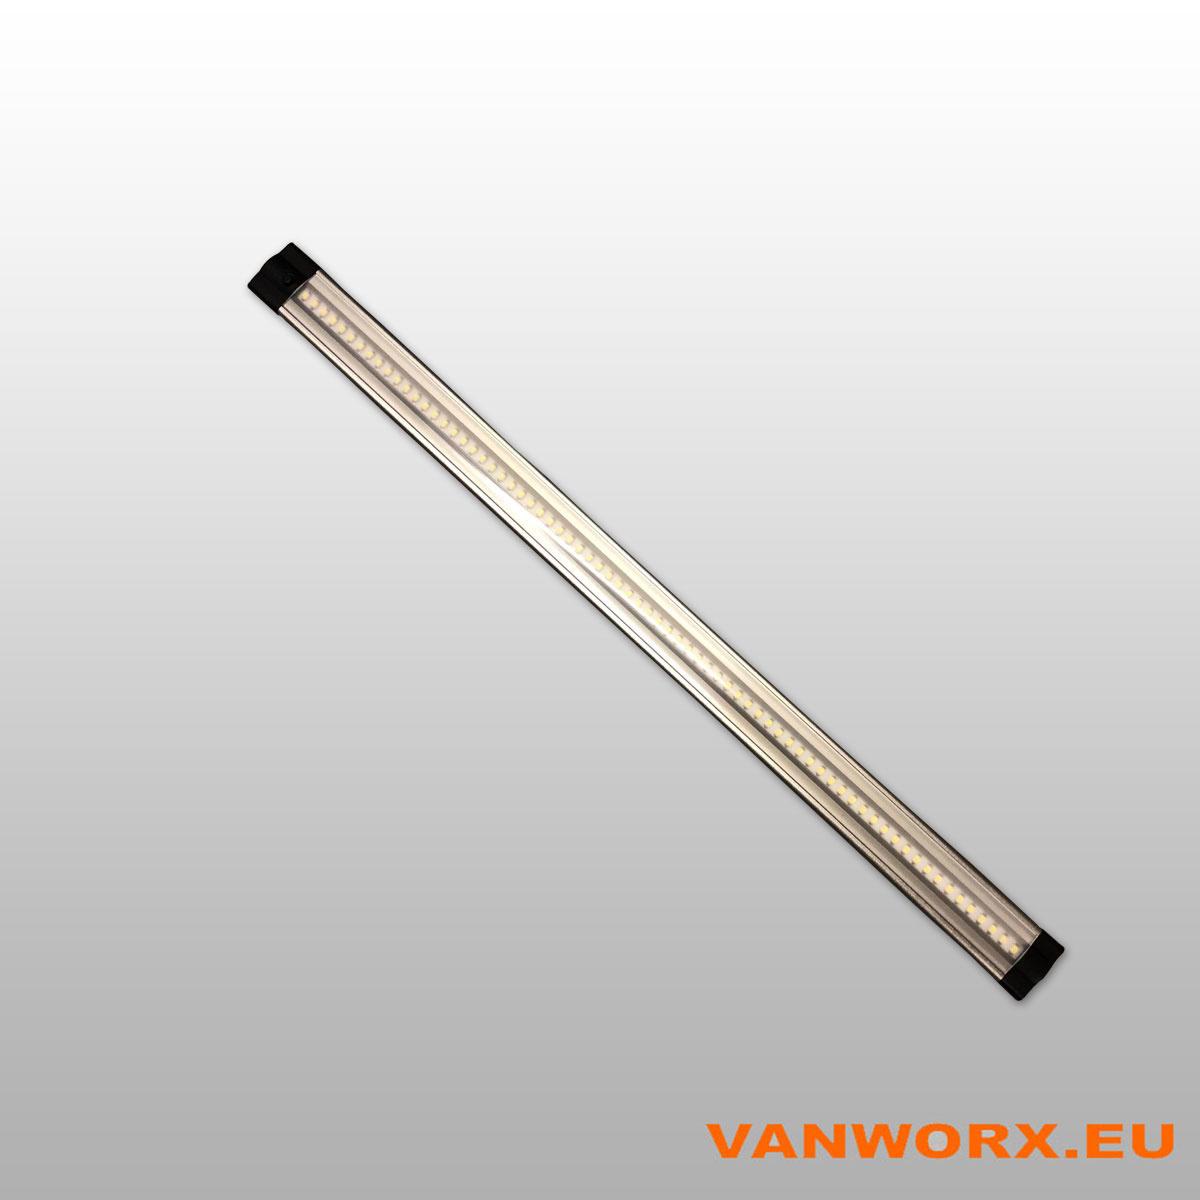 LED-Streifen Alu 1000 mm